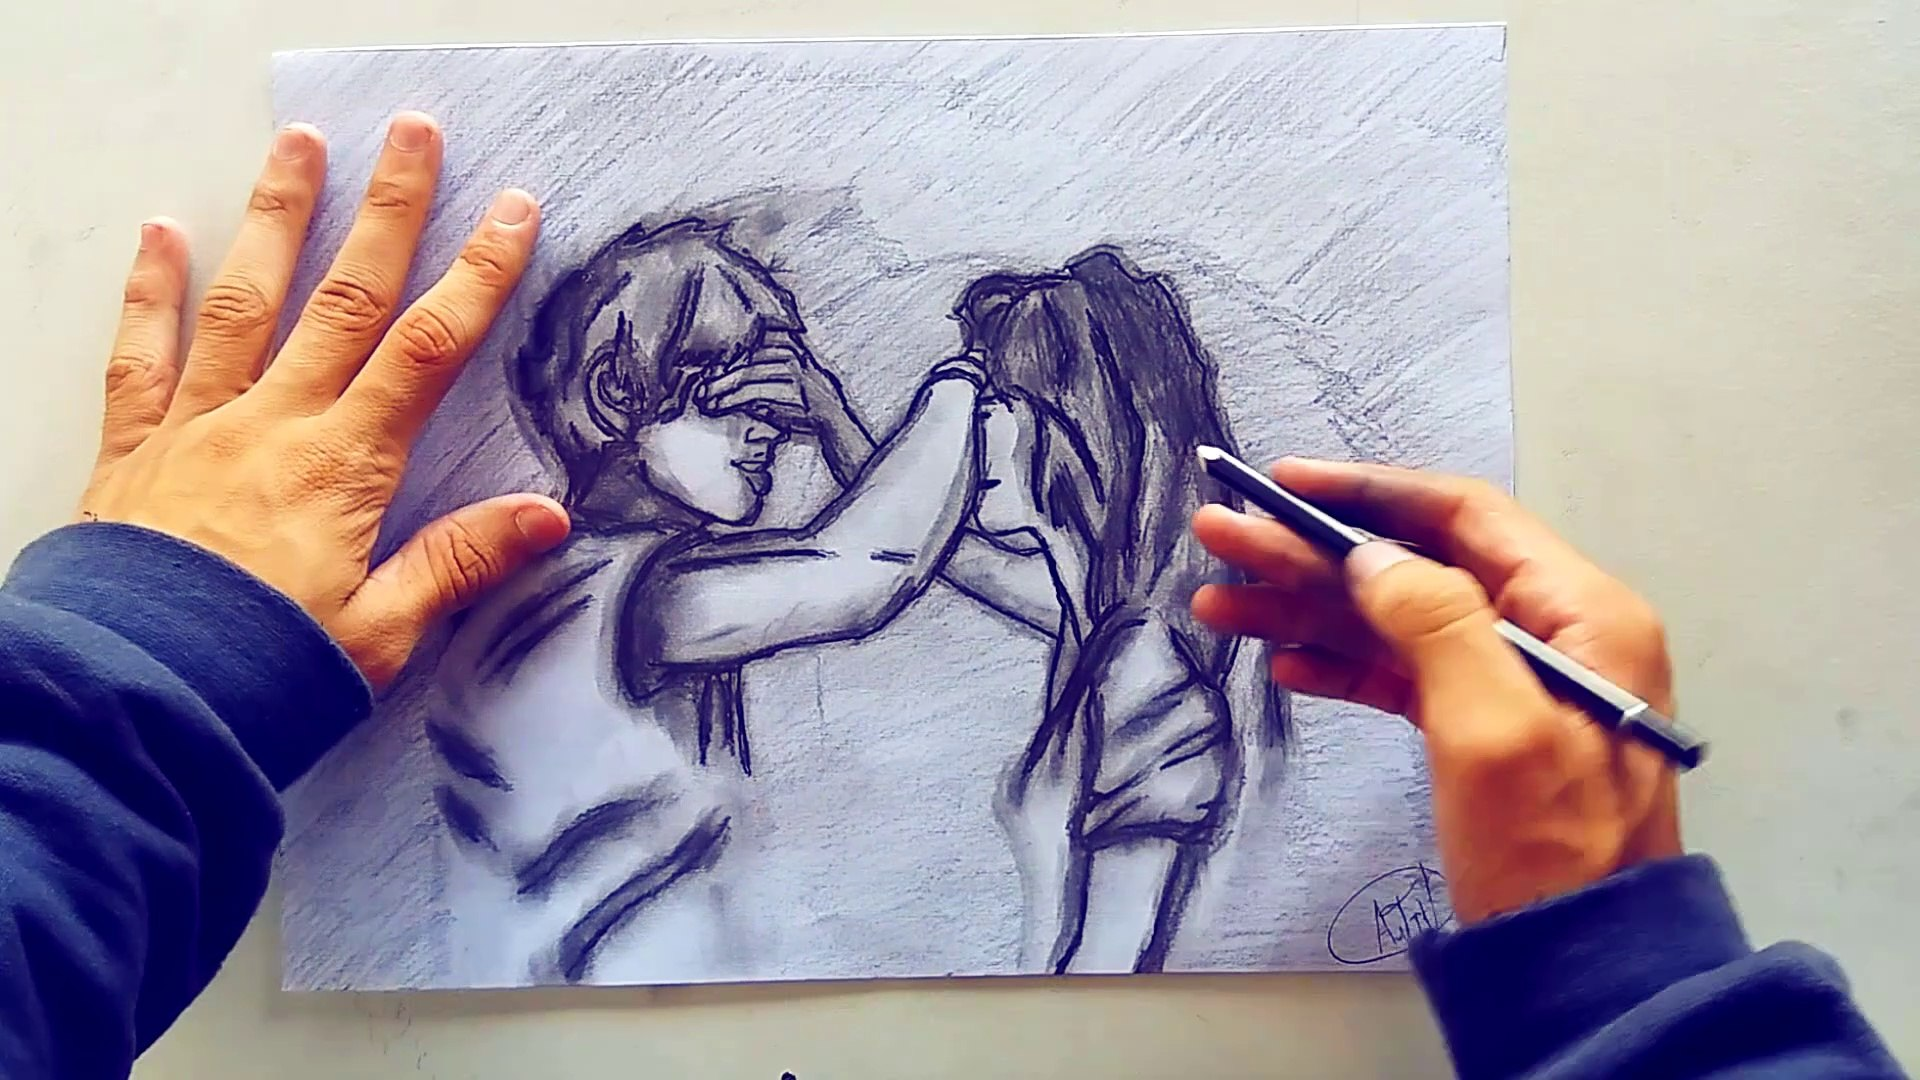 Arttv Desenho Tumblr 1 Namorados Video Dailymotion